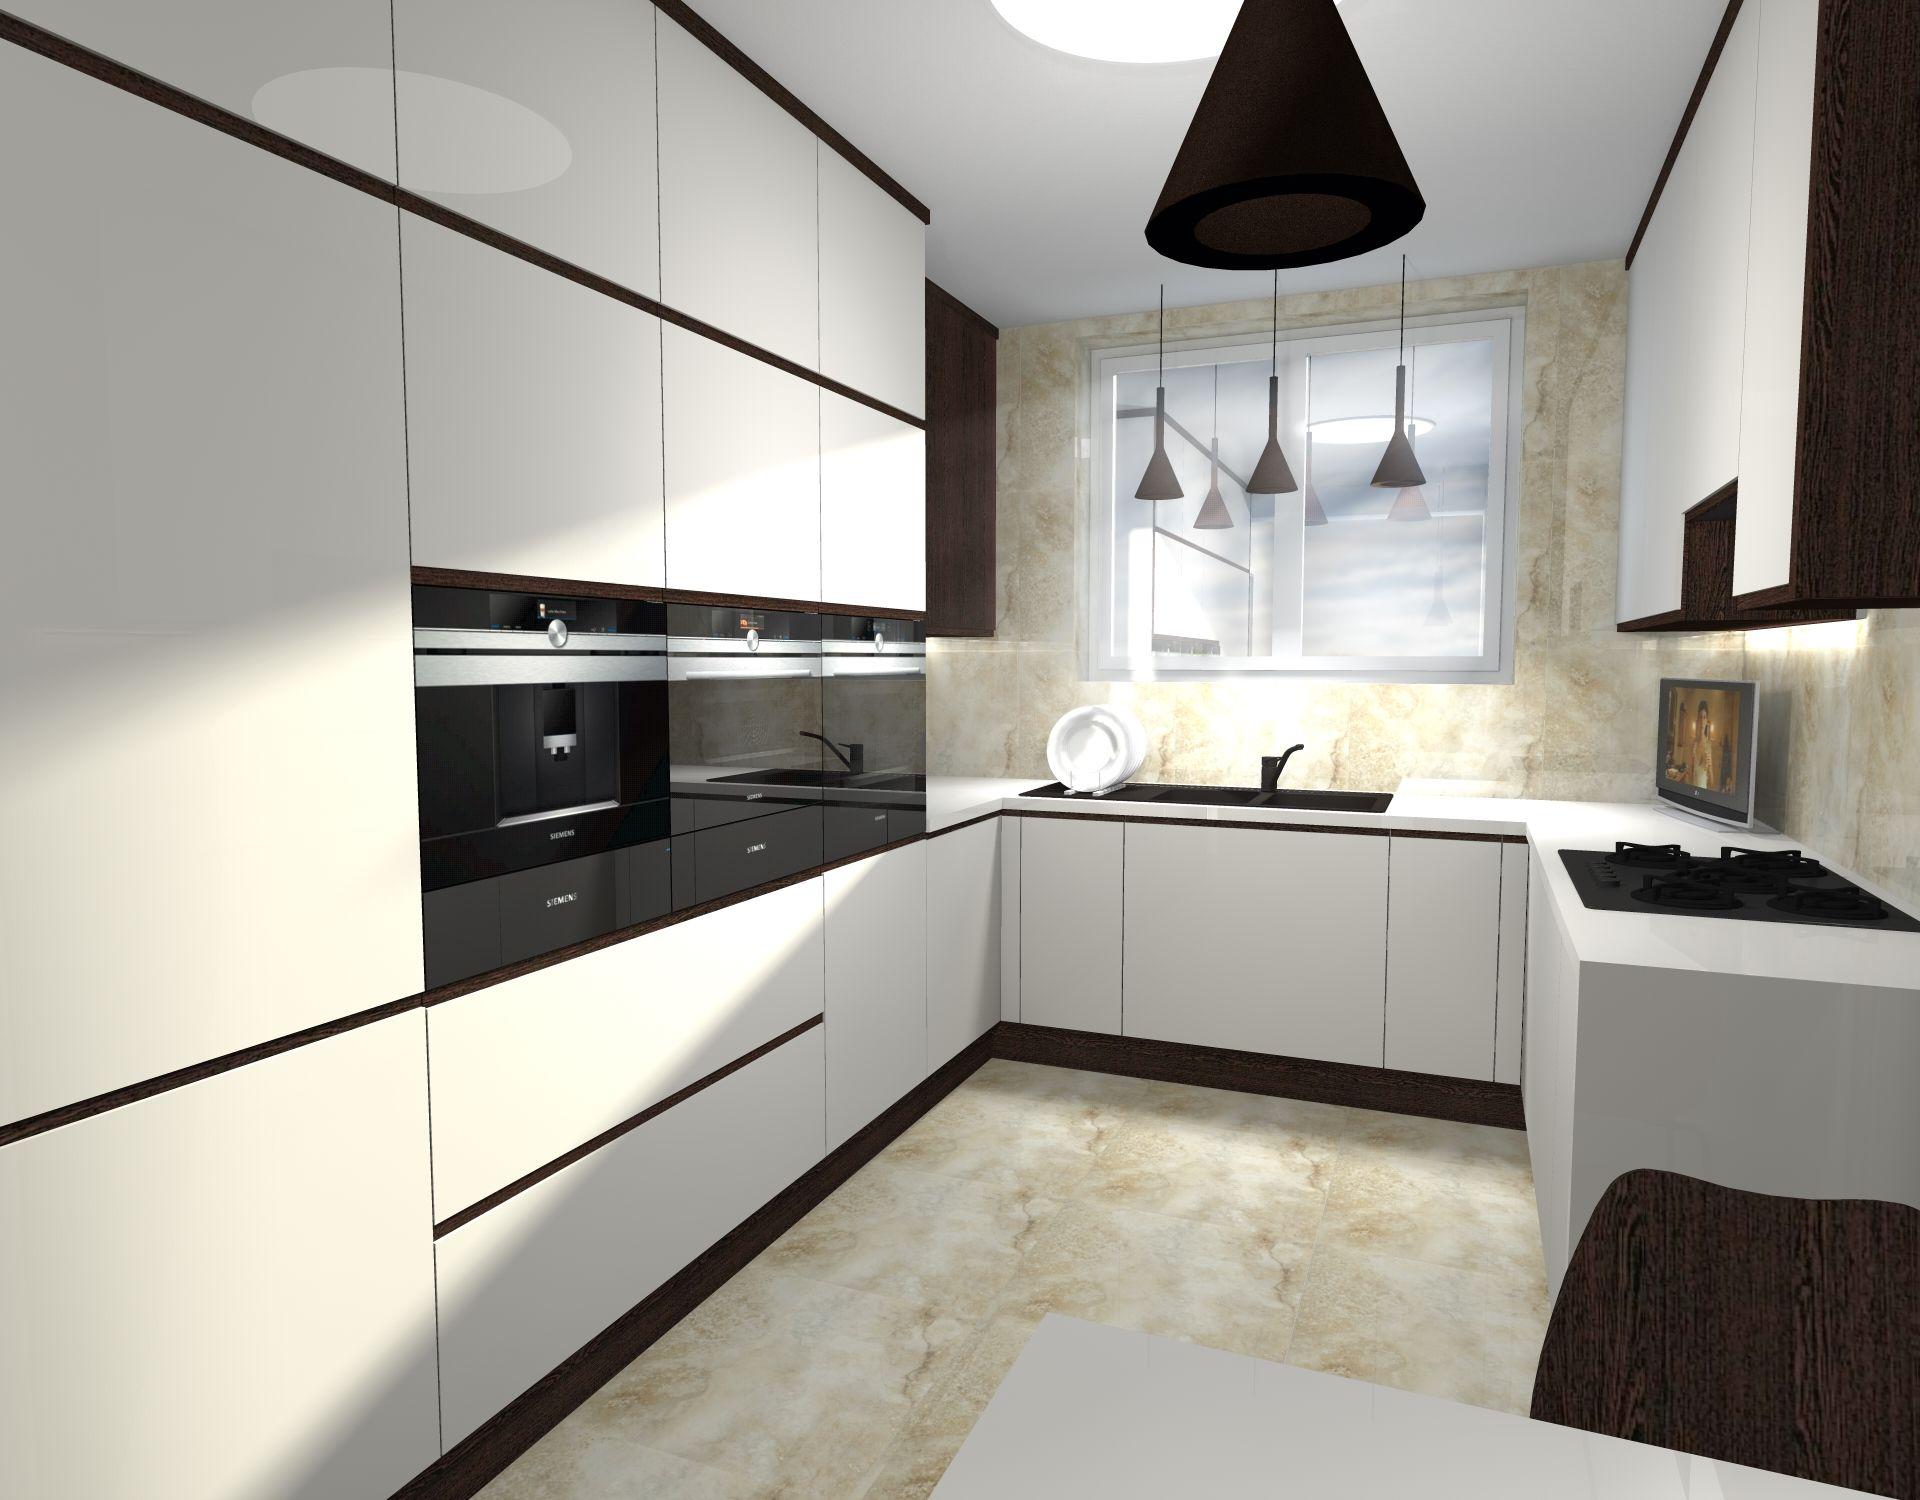 Pin Na Projekty Kuchni Atelier Lillet